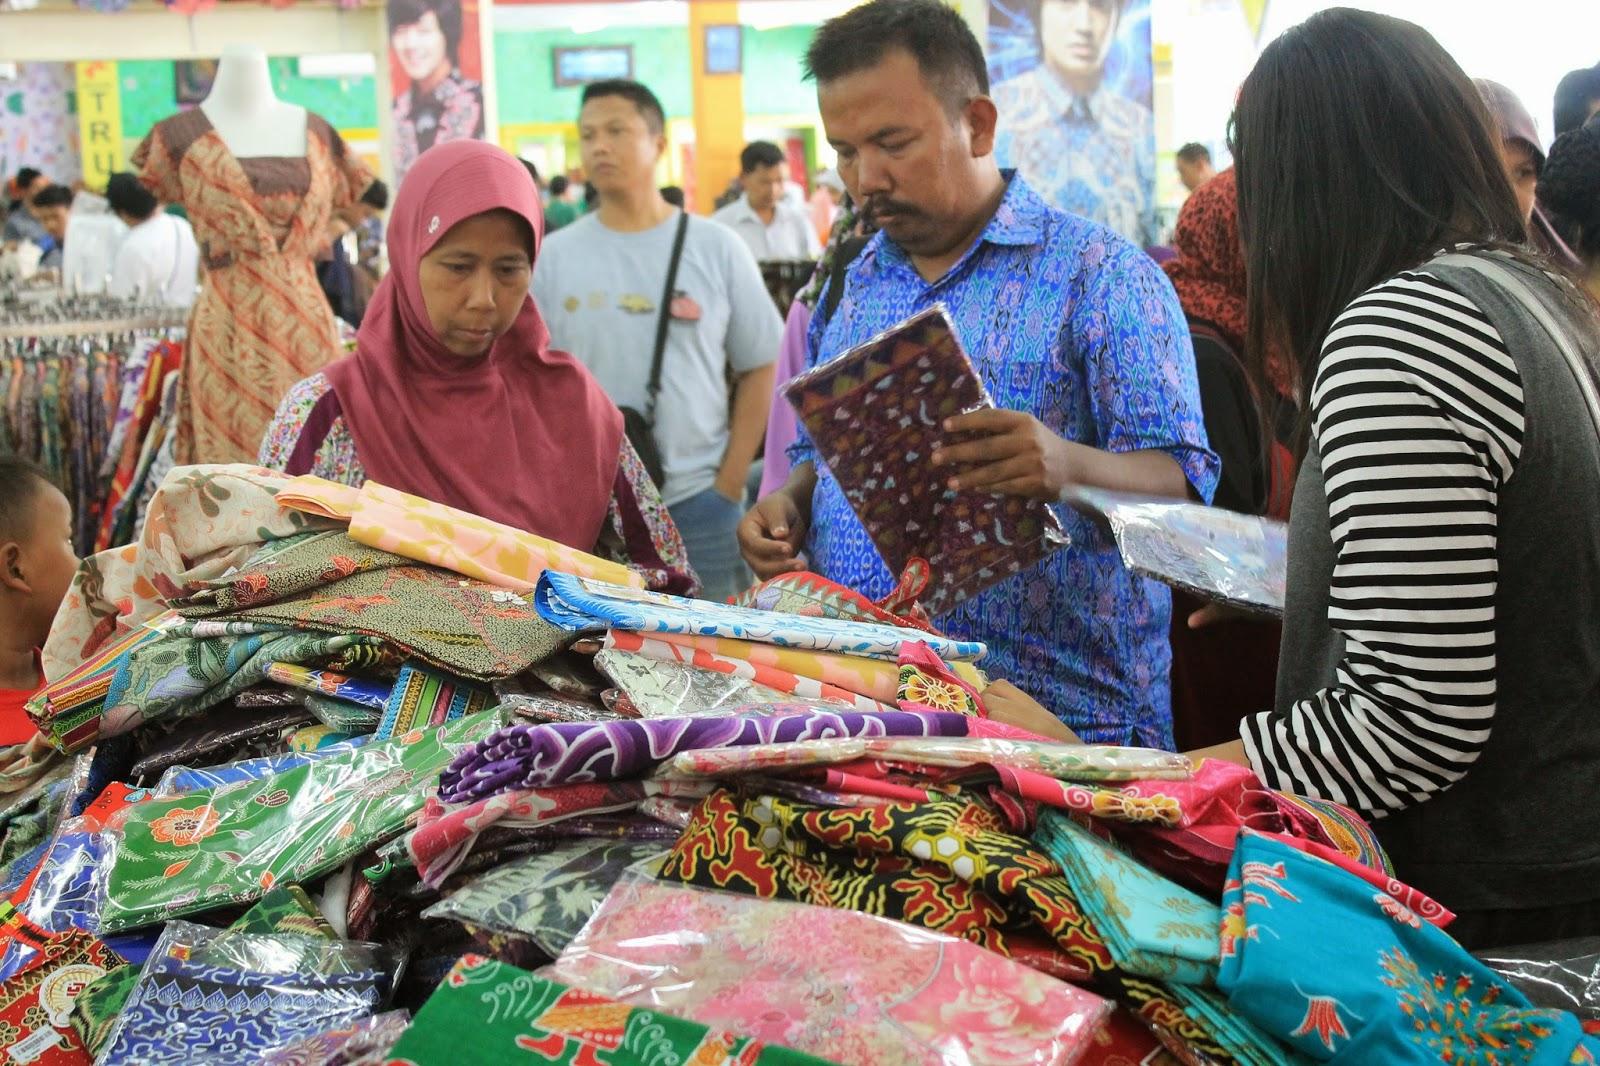 Agustus 2014 Pusat Grosir Batik Trusmi Produk Ukm Bumn Bahan Songket Sulam Katun Merah Tidak Masalah Motif Dicontek